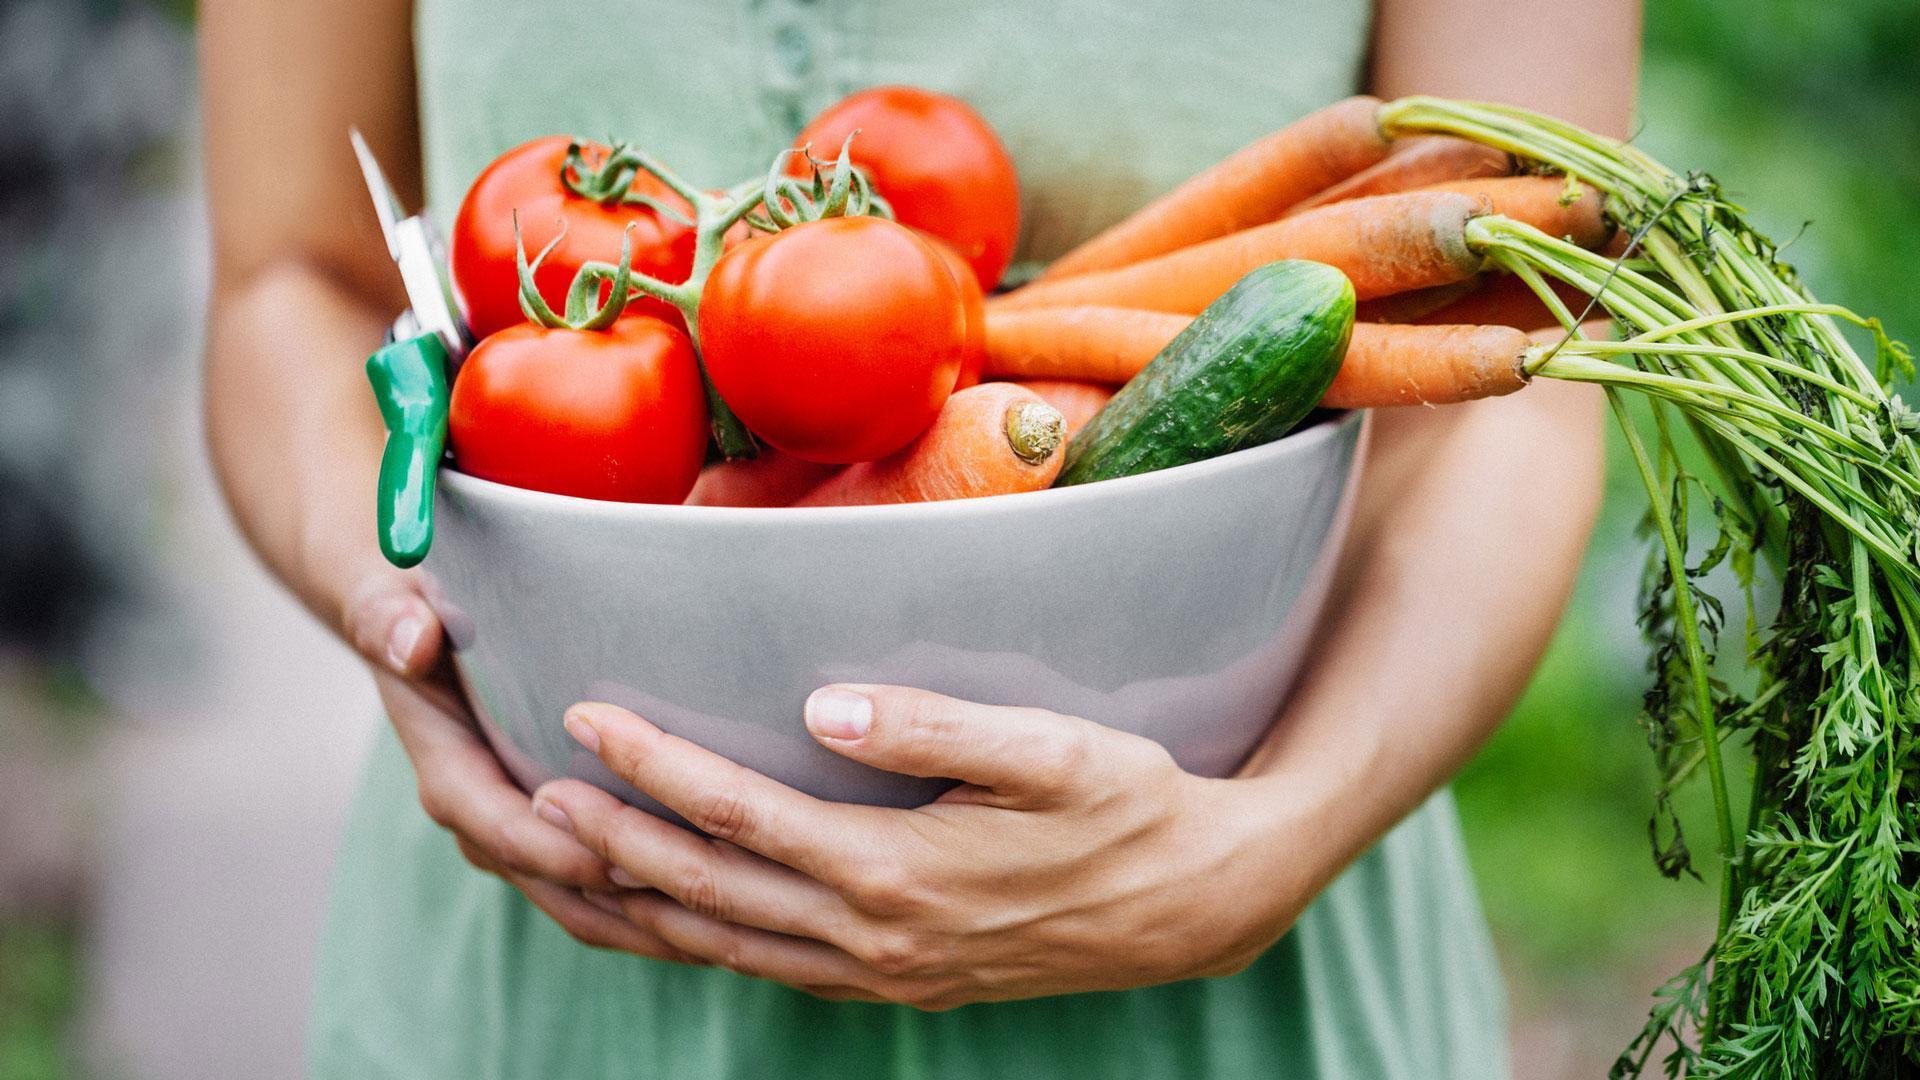 Make Produce Last Longer